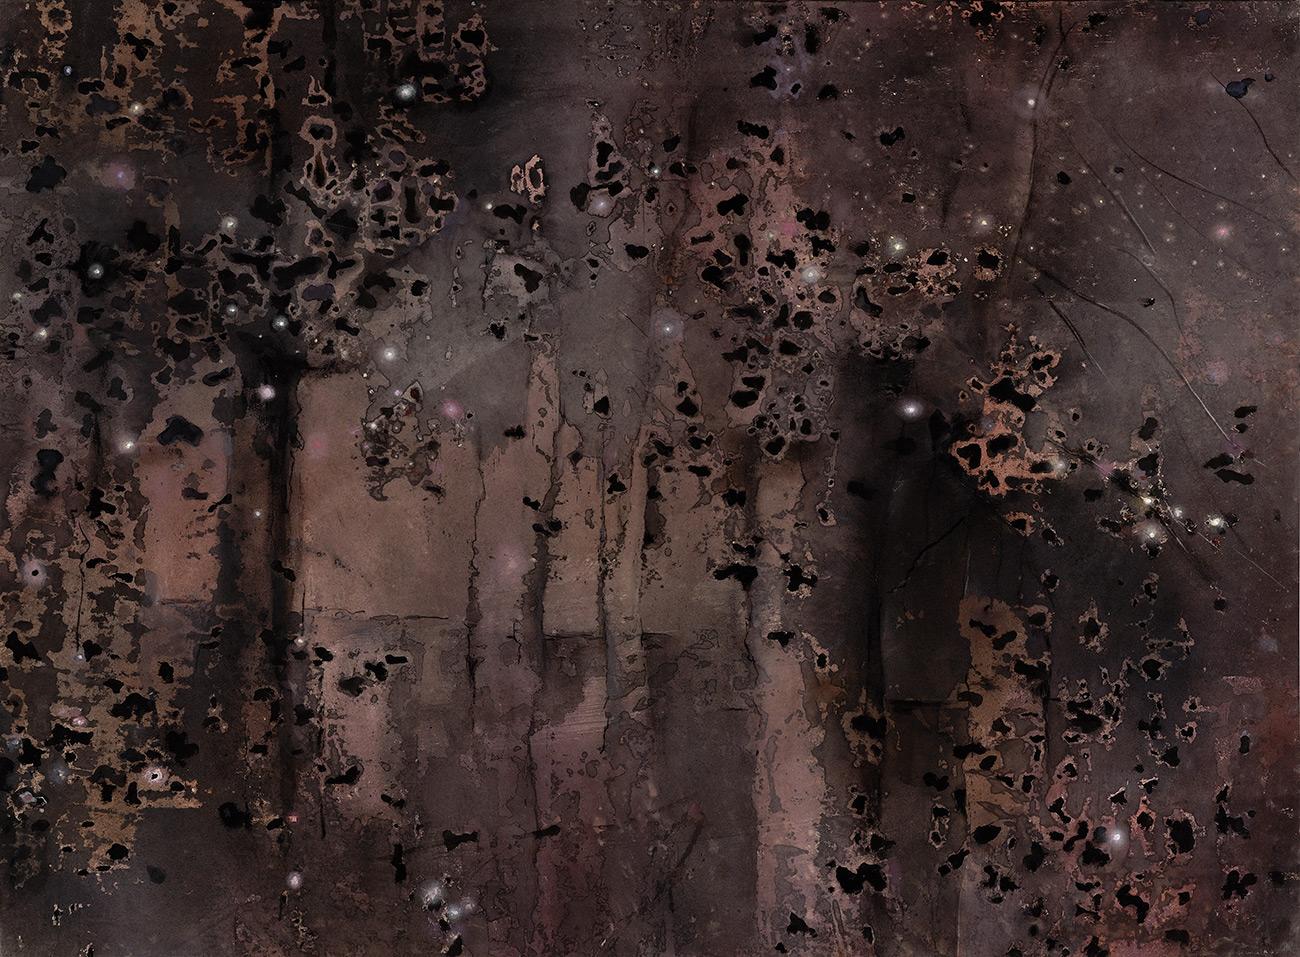 Night Coppice  1999, 173 x 229 cm